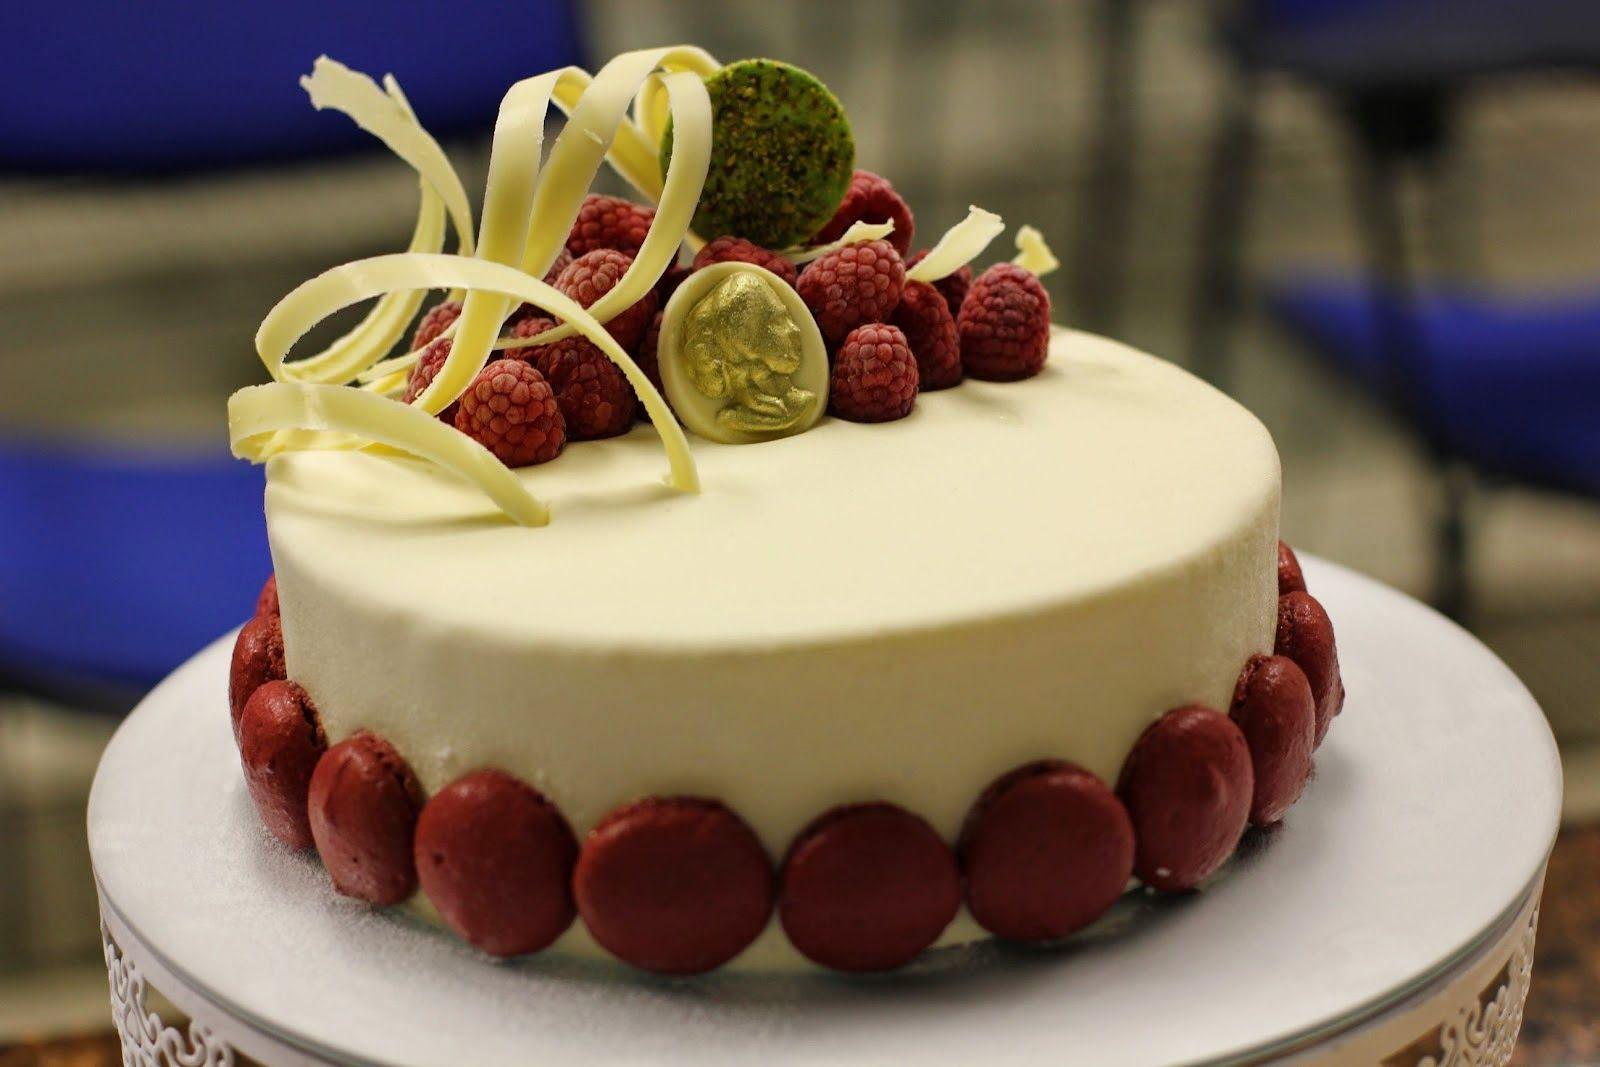 Receitas Rápidas e Fáceis: Receita de Torta Gelada de Chocolate Branco